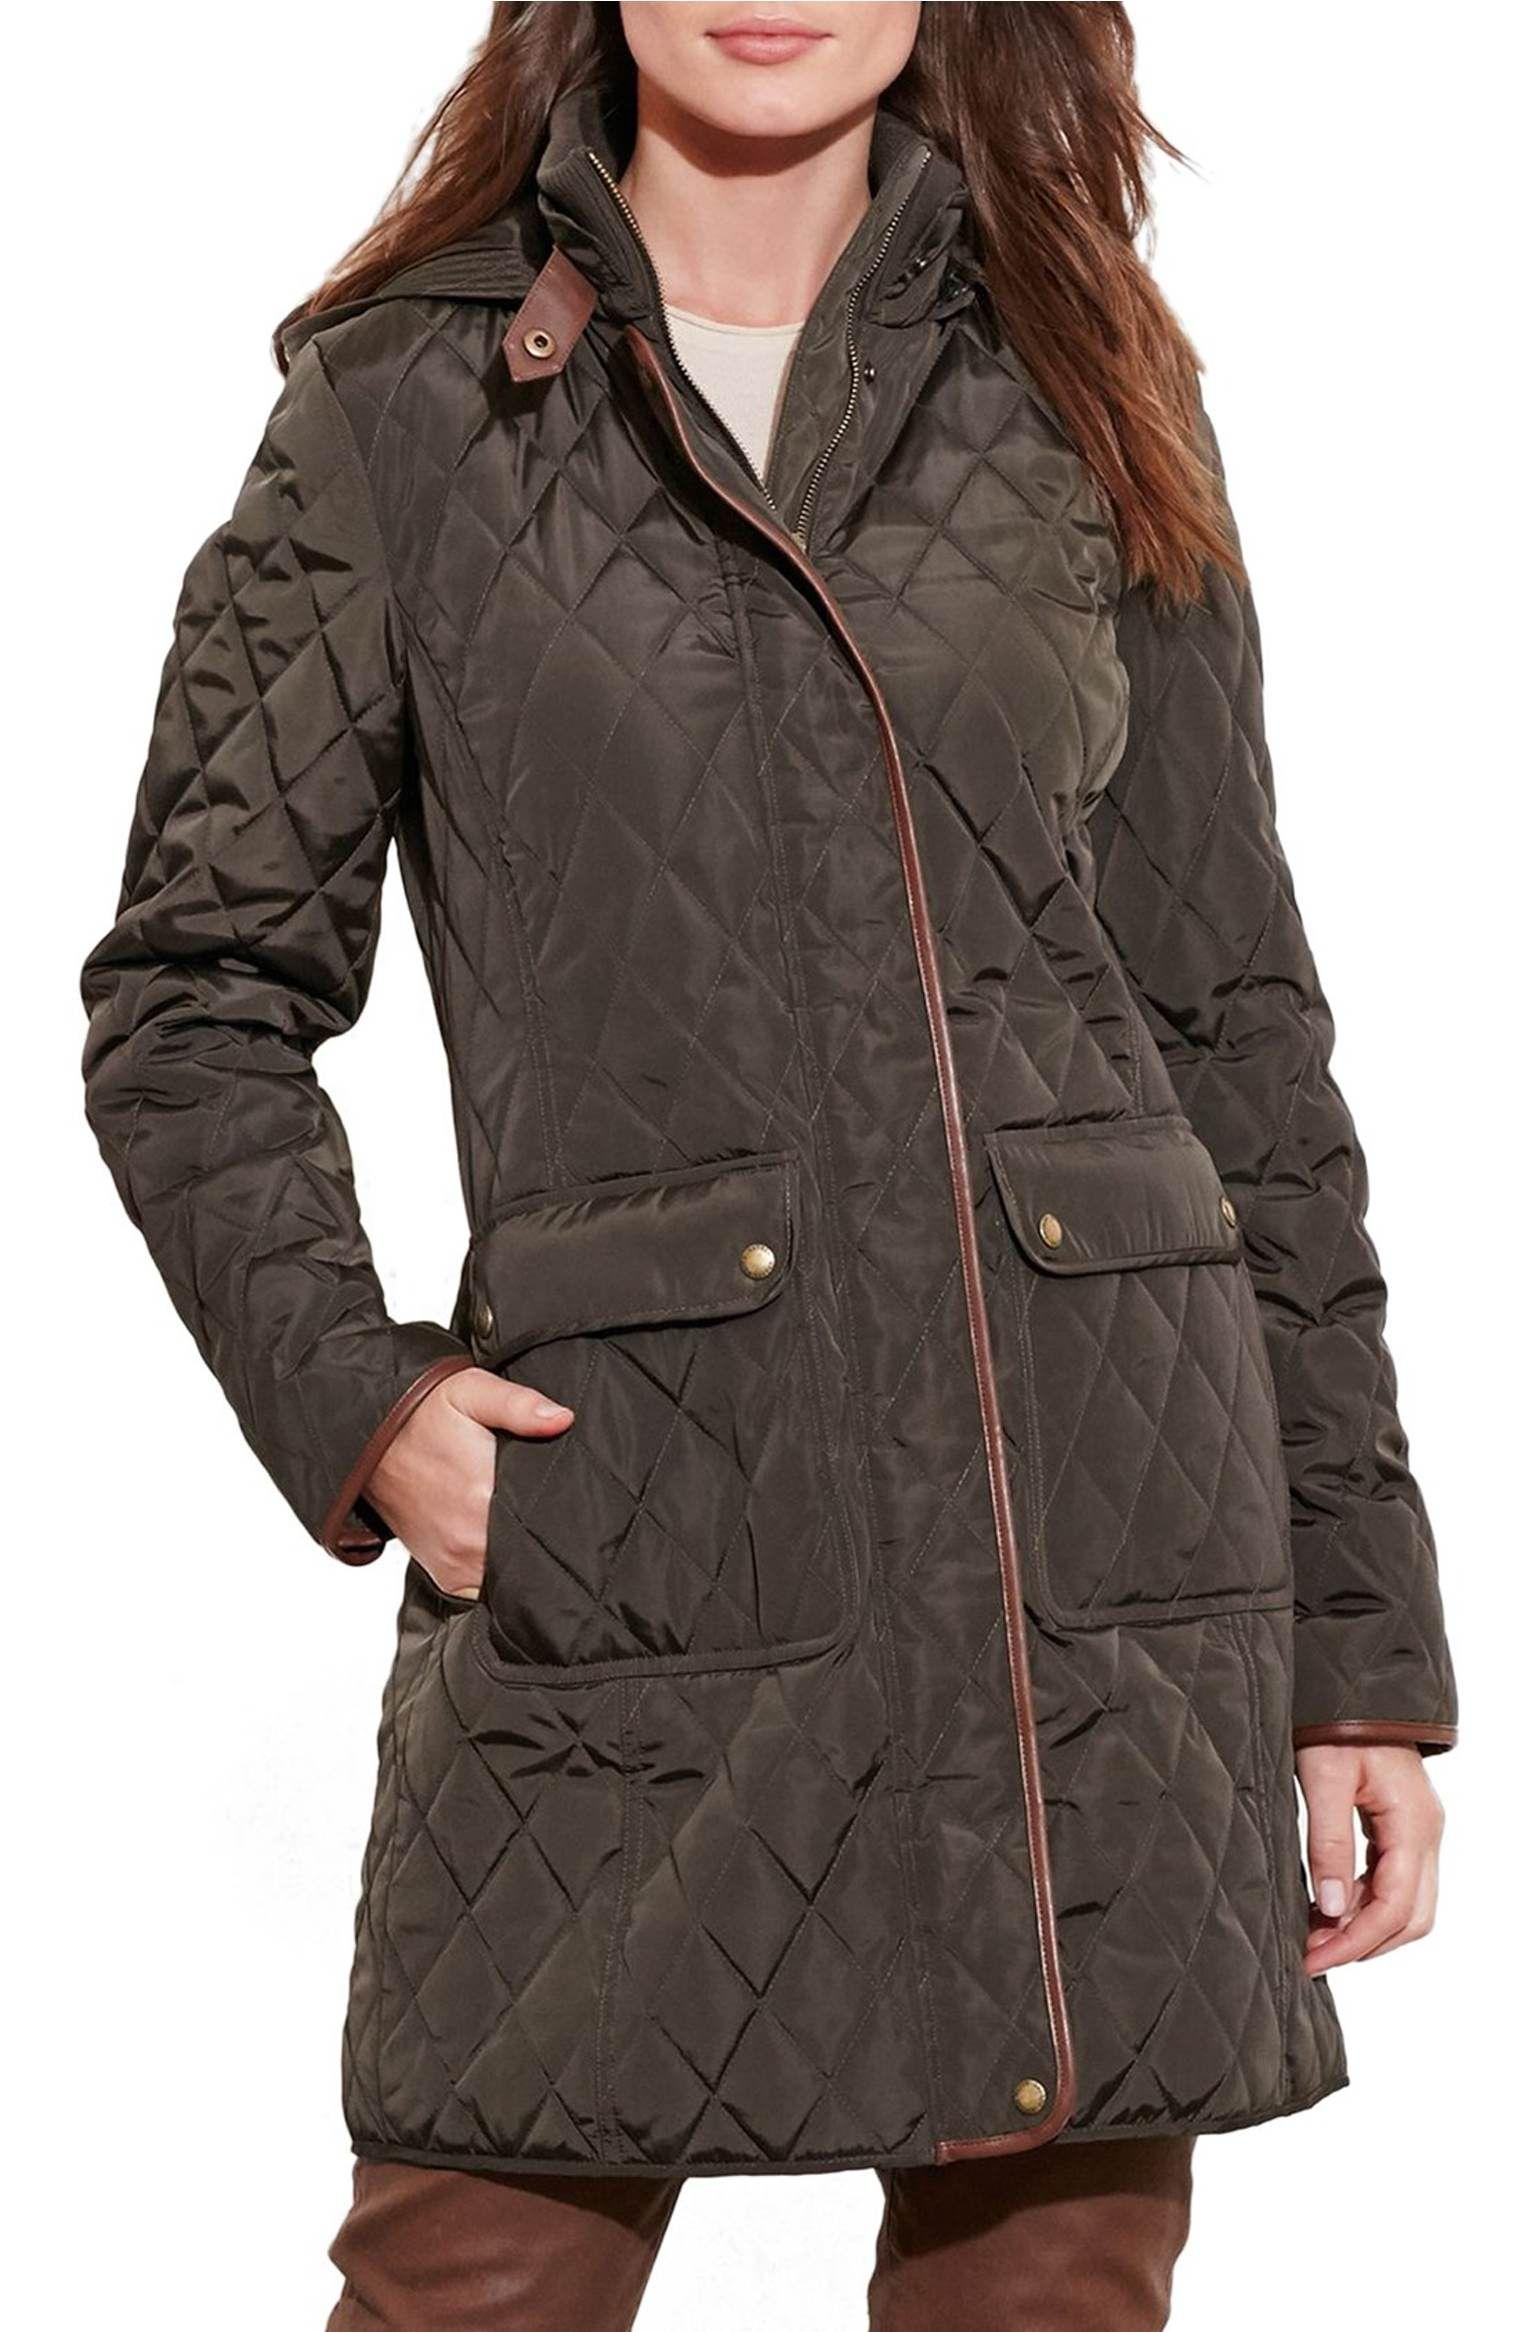 Main Image - Lauren Ralph Lauren Diamond Quilted Coat with Faux Leather Trim (Regular & Petite)